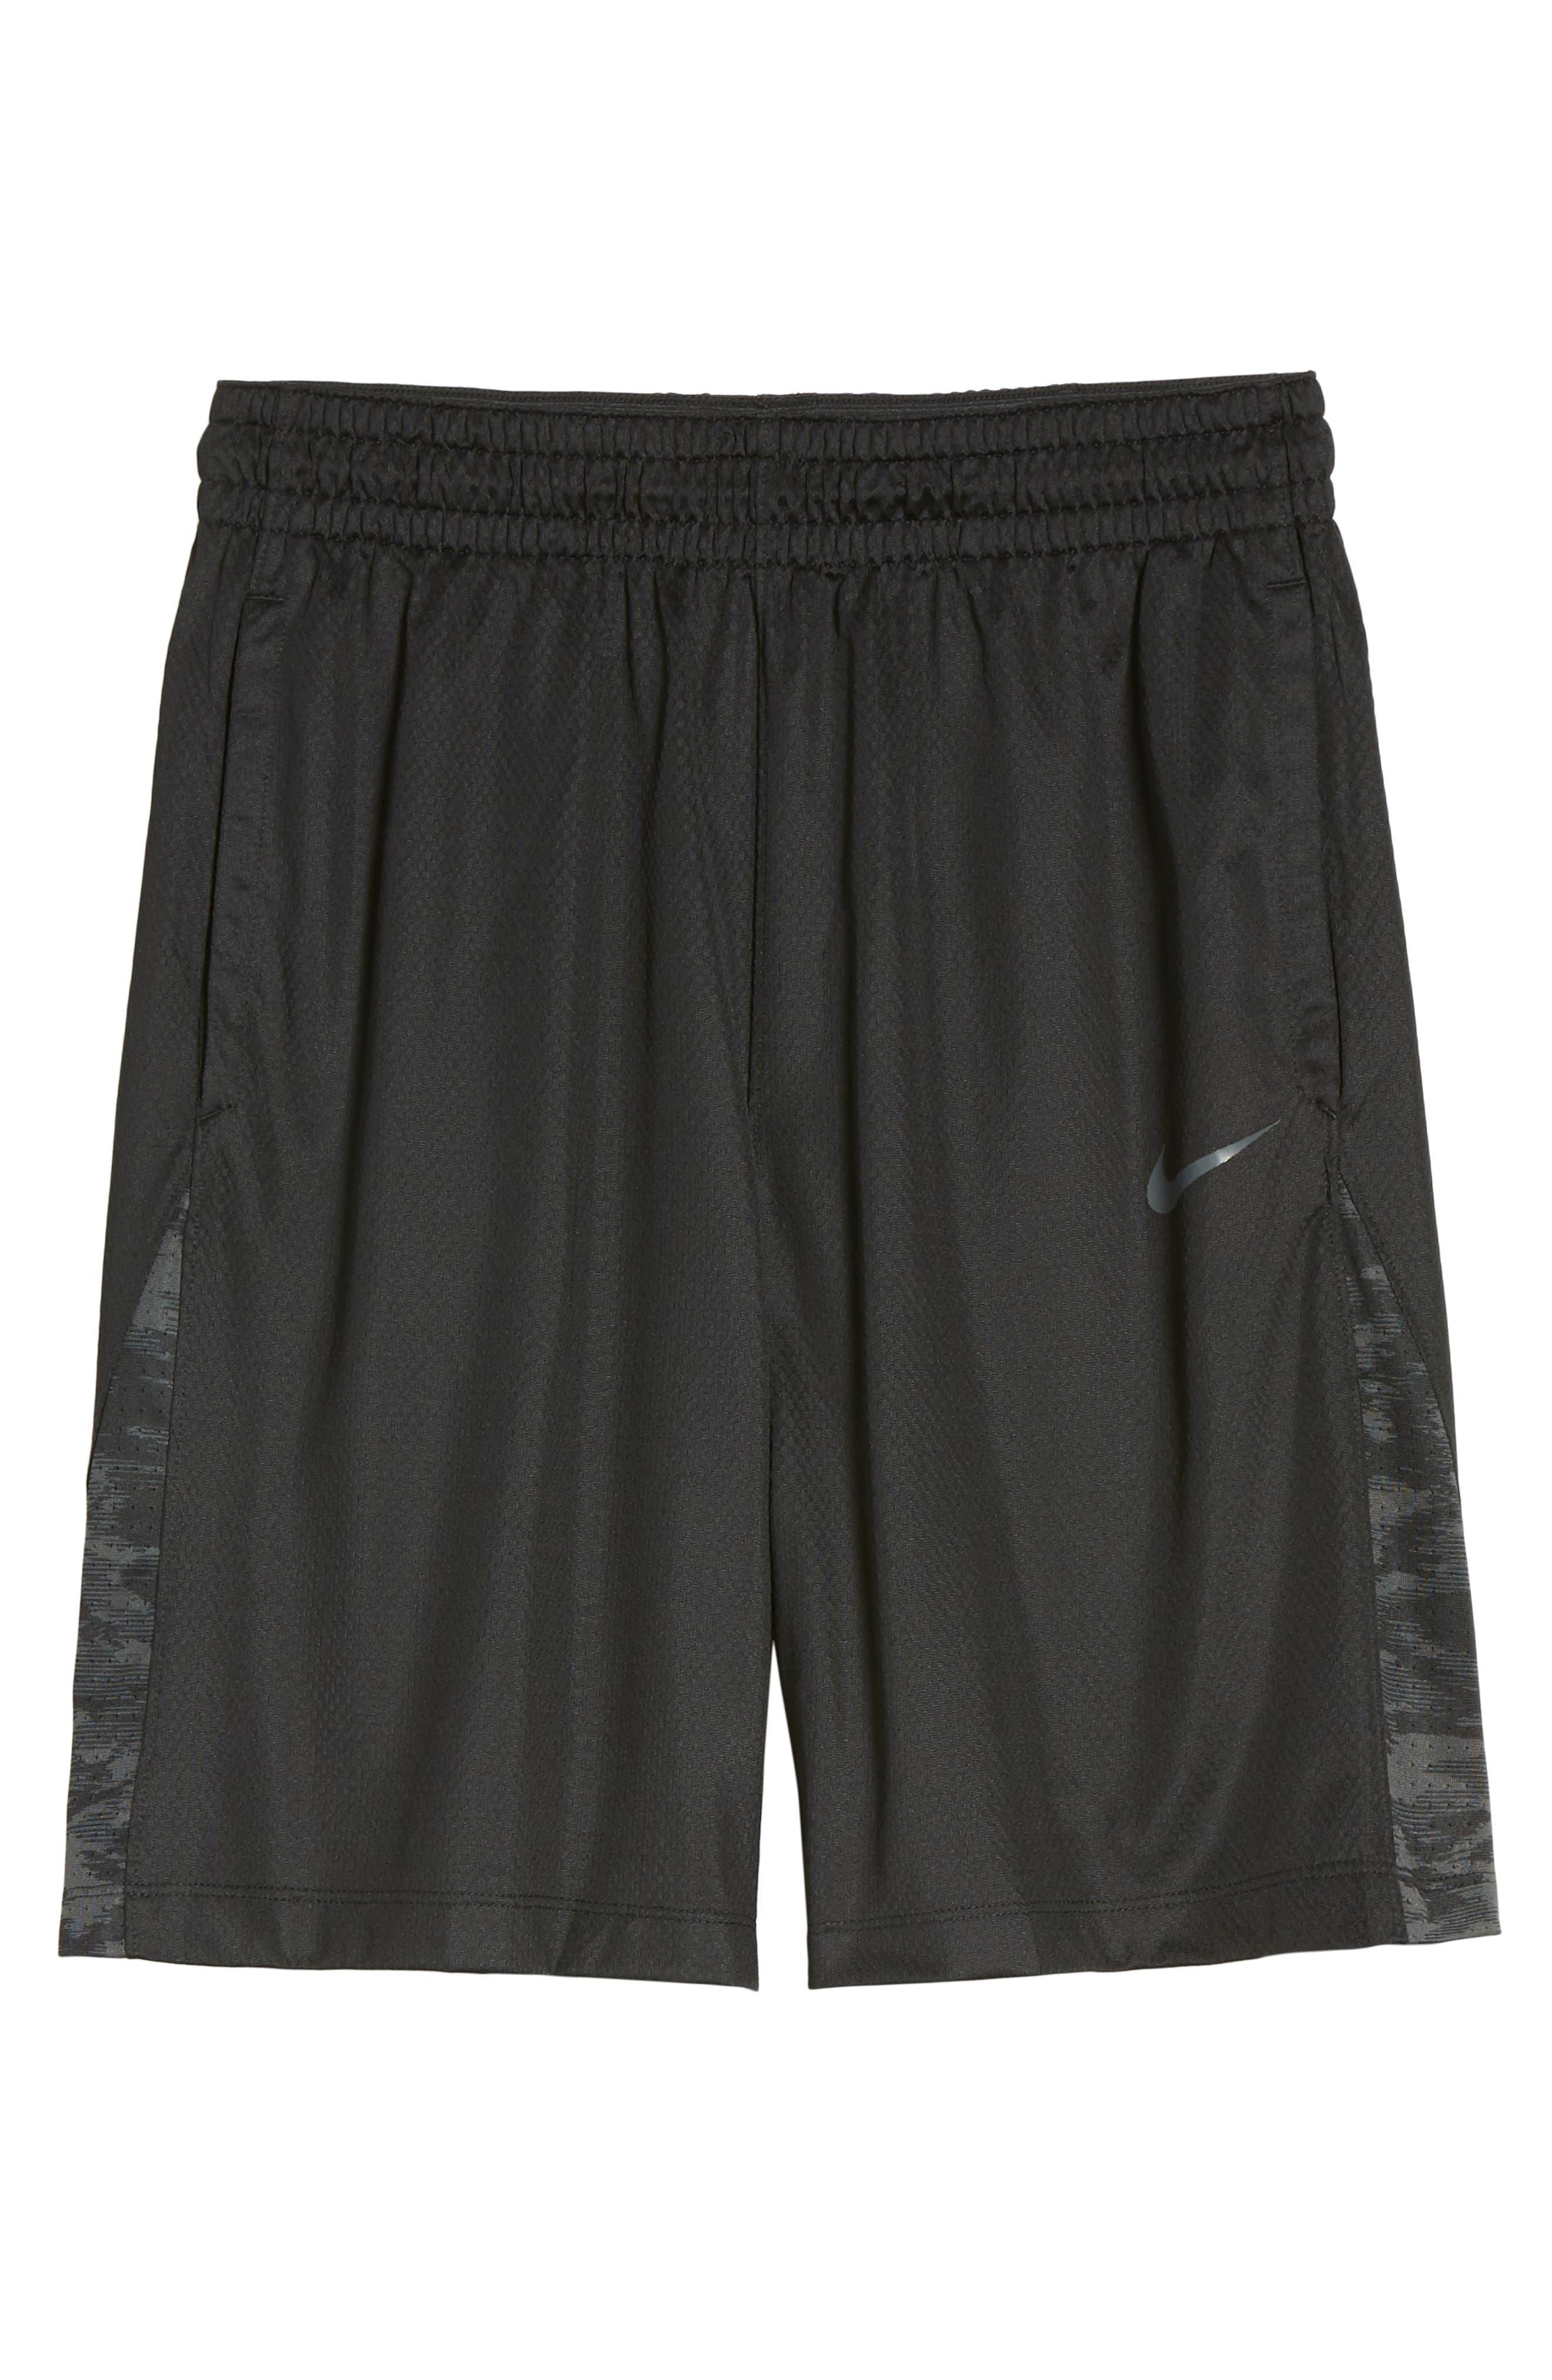 Basketball Shorts,                             Alternate thumbnail 6, color,                             010